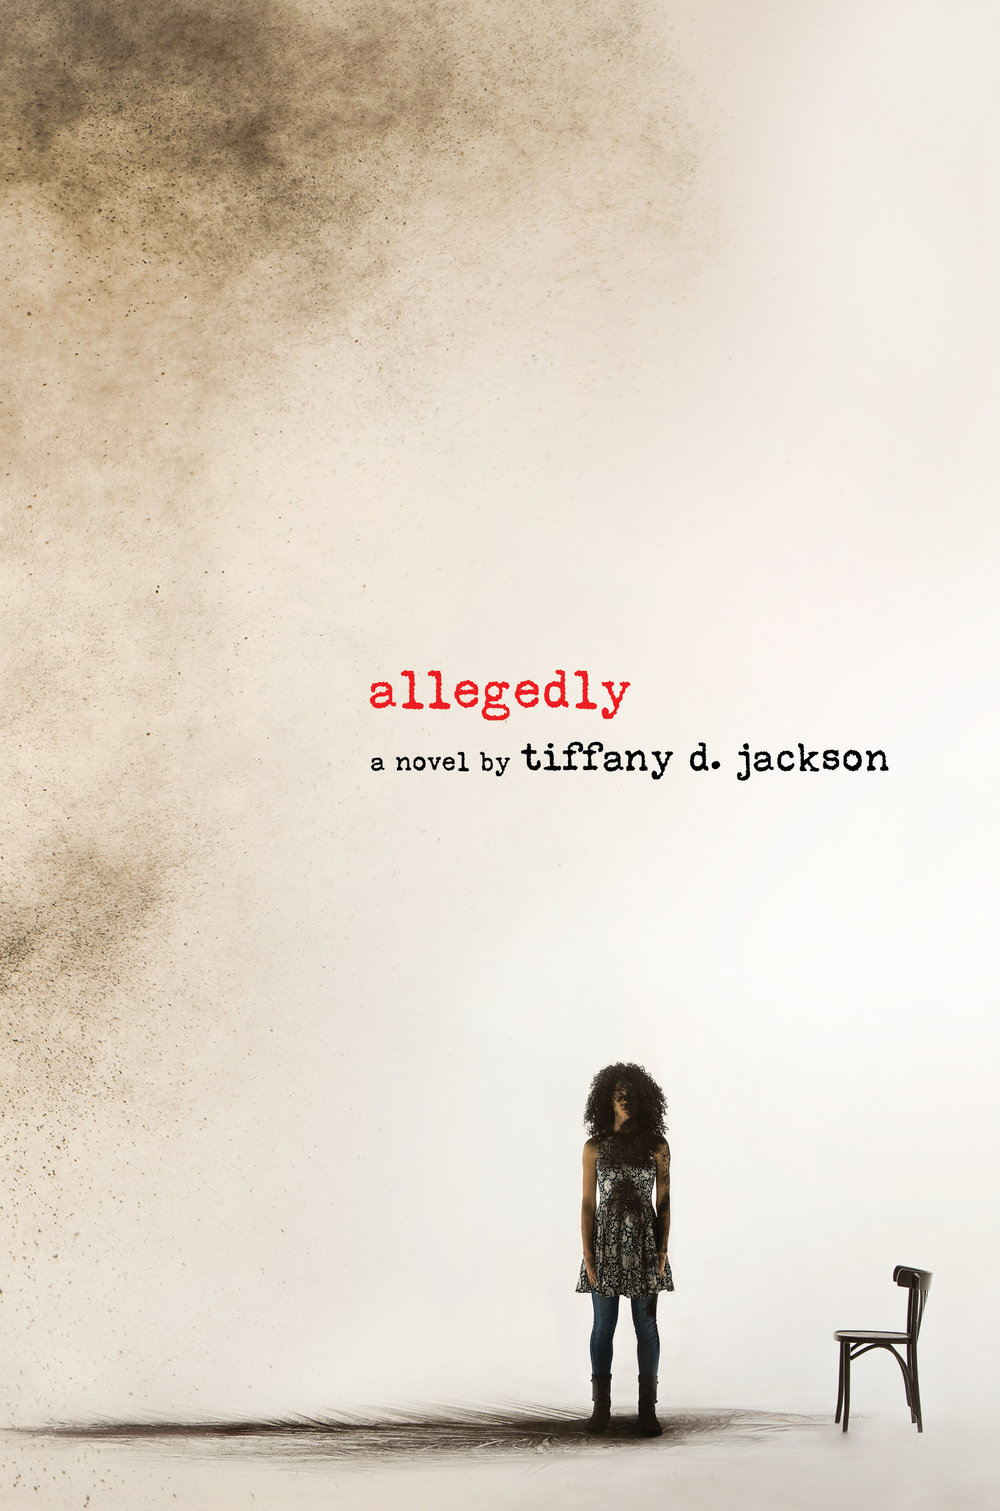 tiffany-jackson-allegedly.jpg